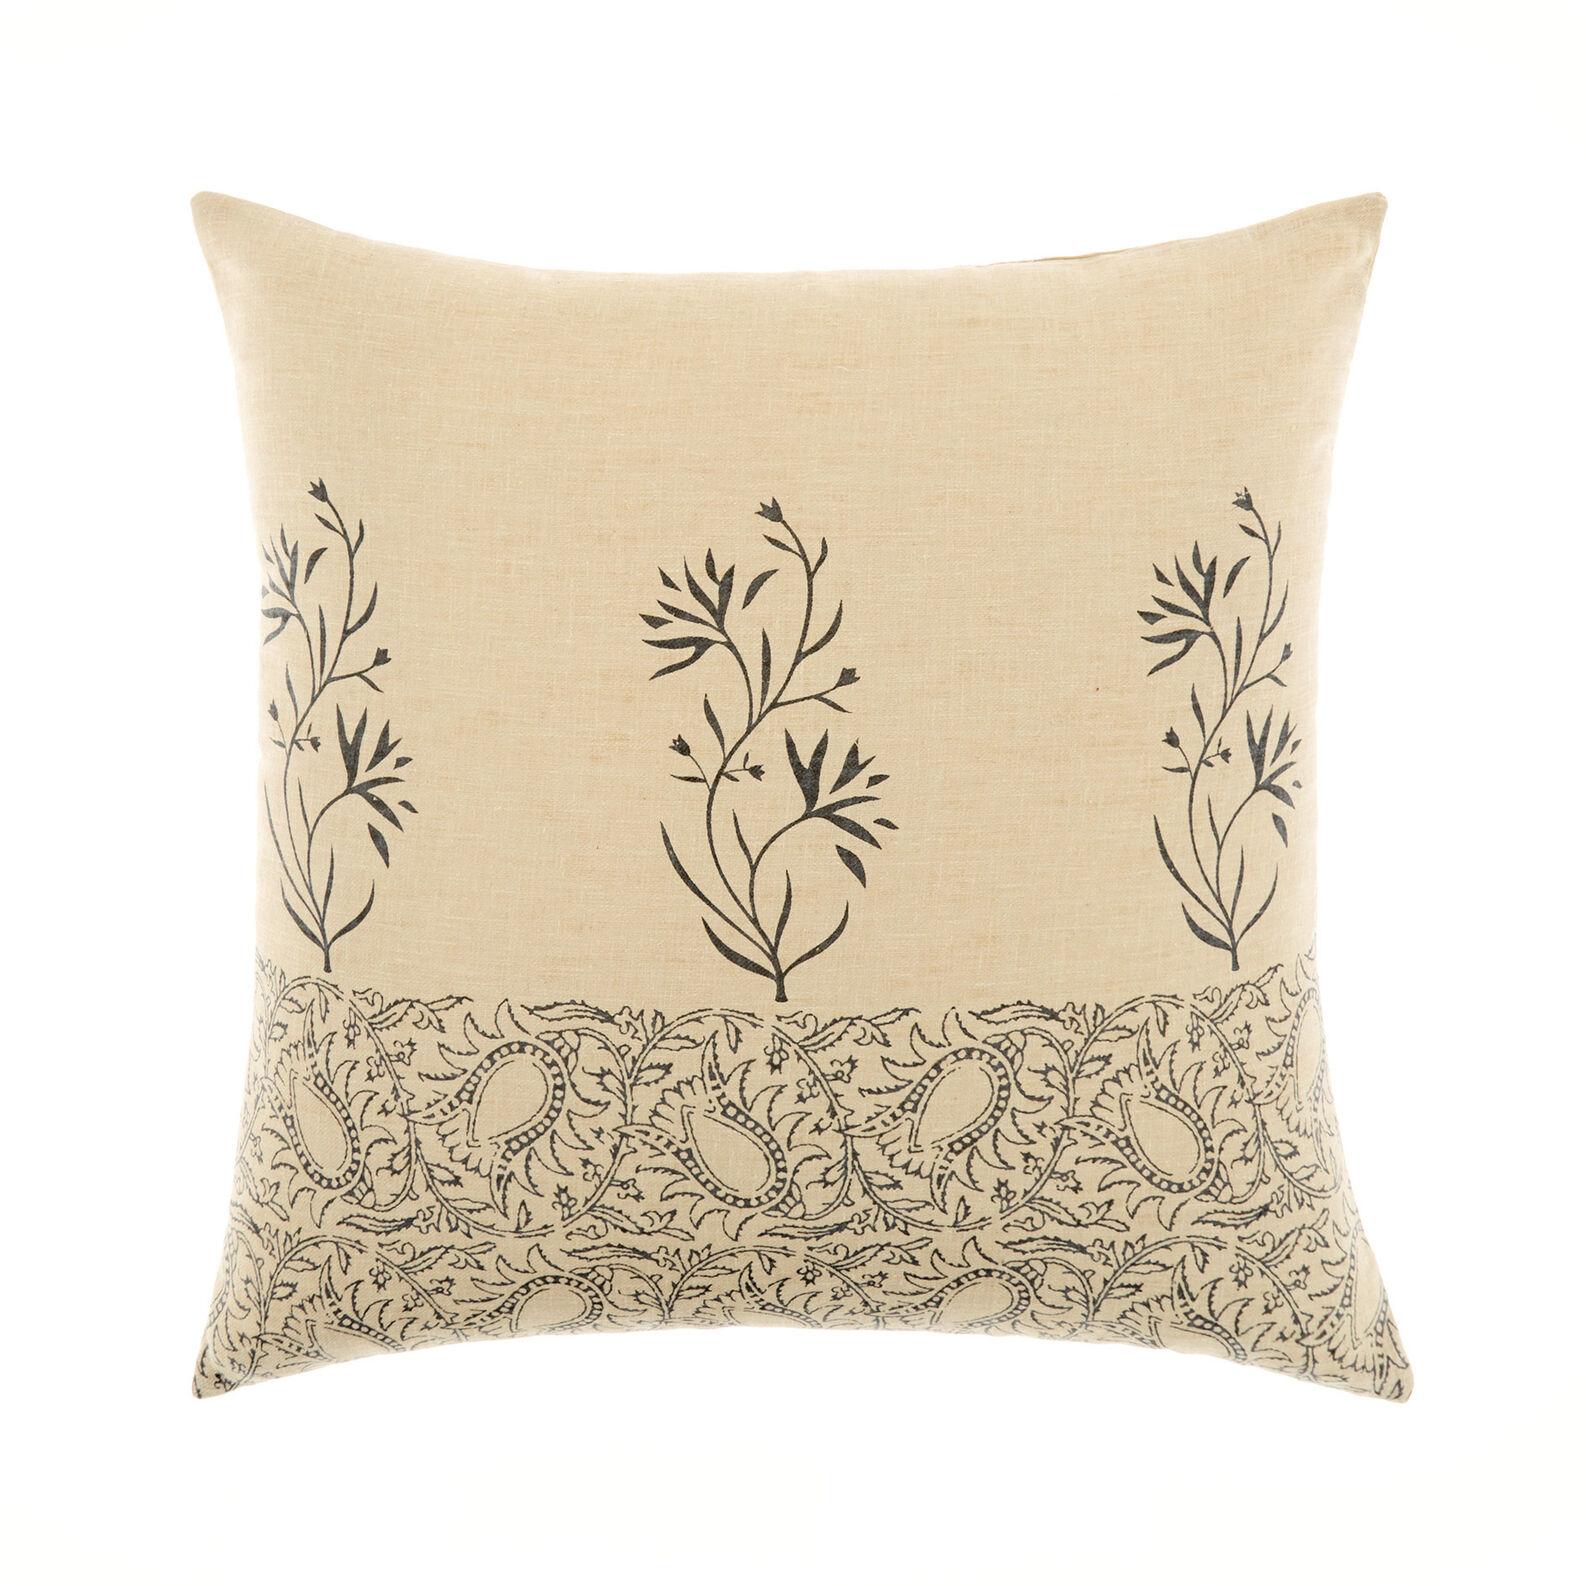 Cuscino stampa botanica